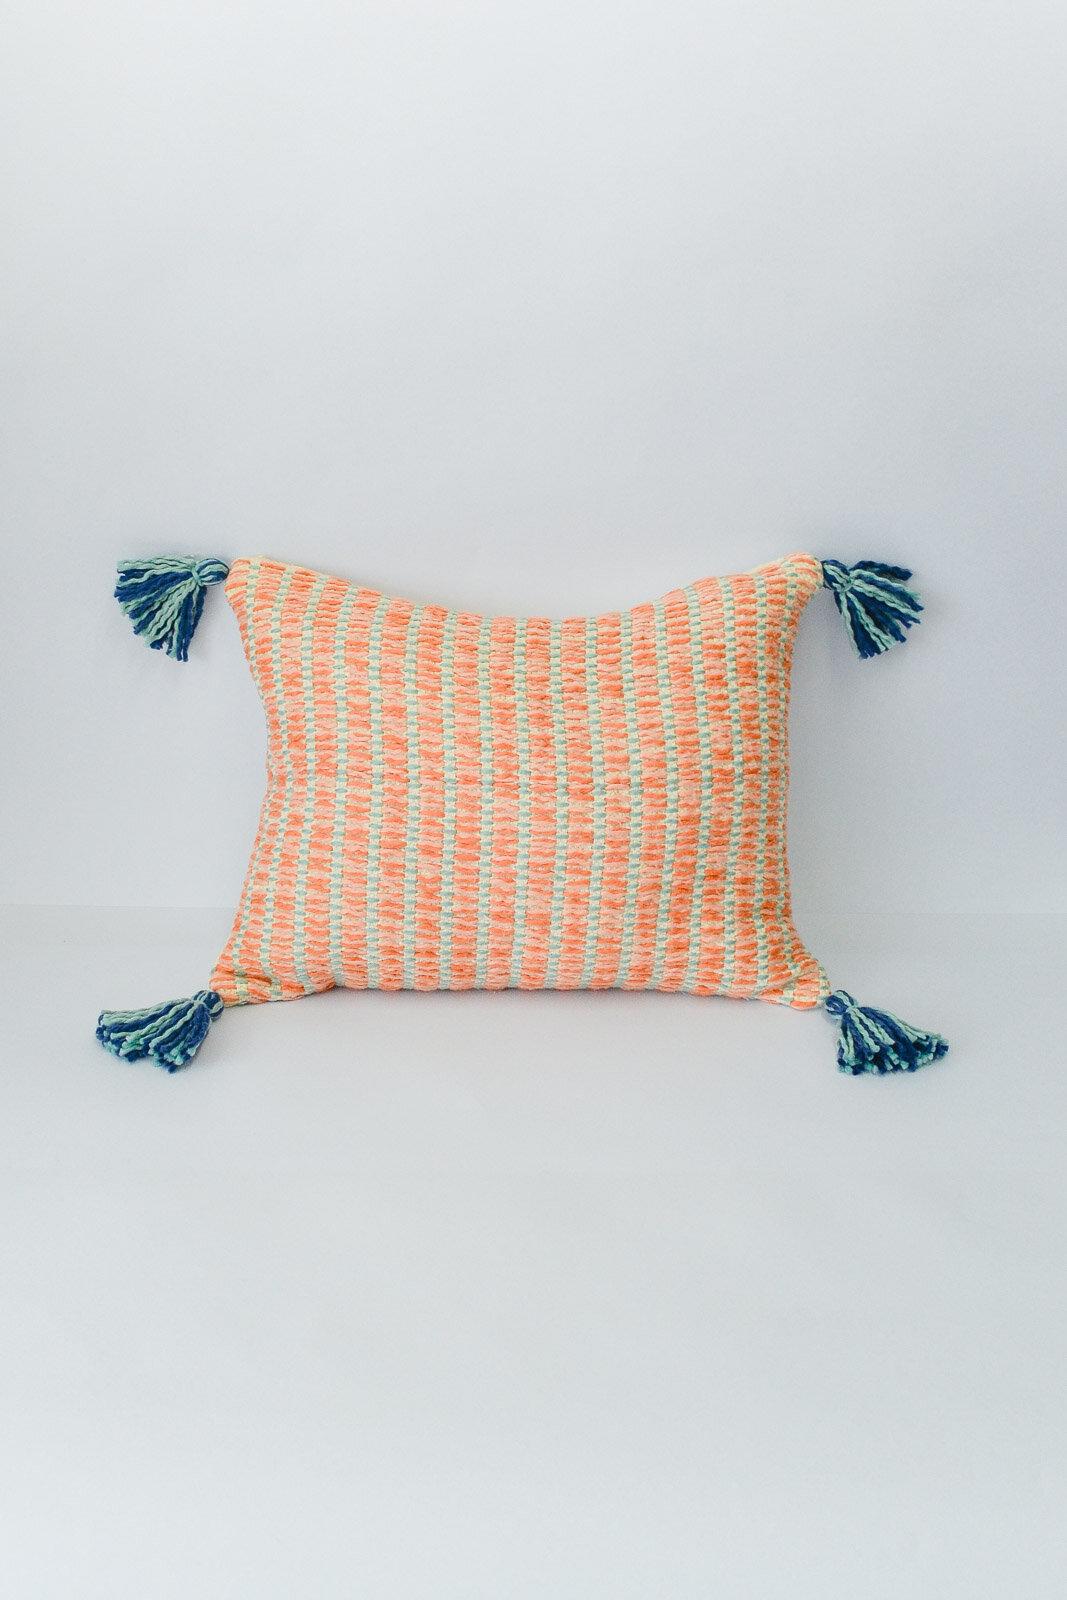 Handwoven Organic Cotton Pillow Zuahaza Colombian Home Textiles